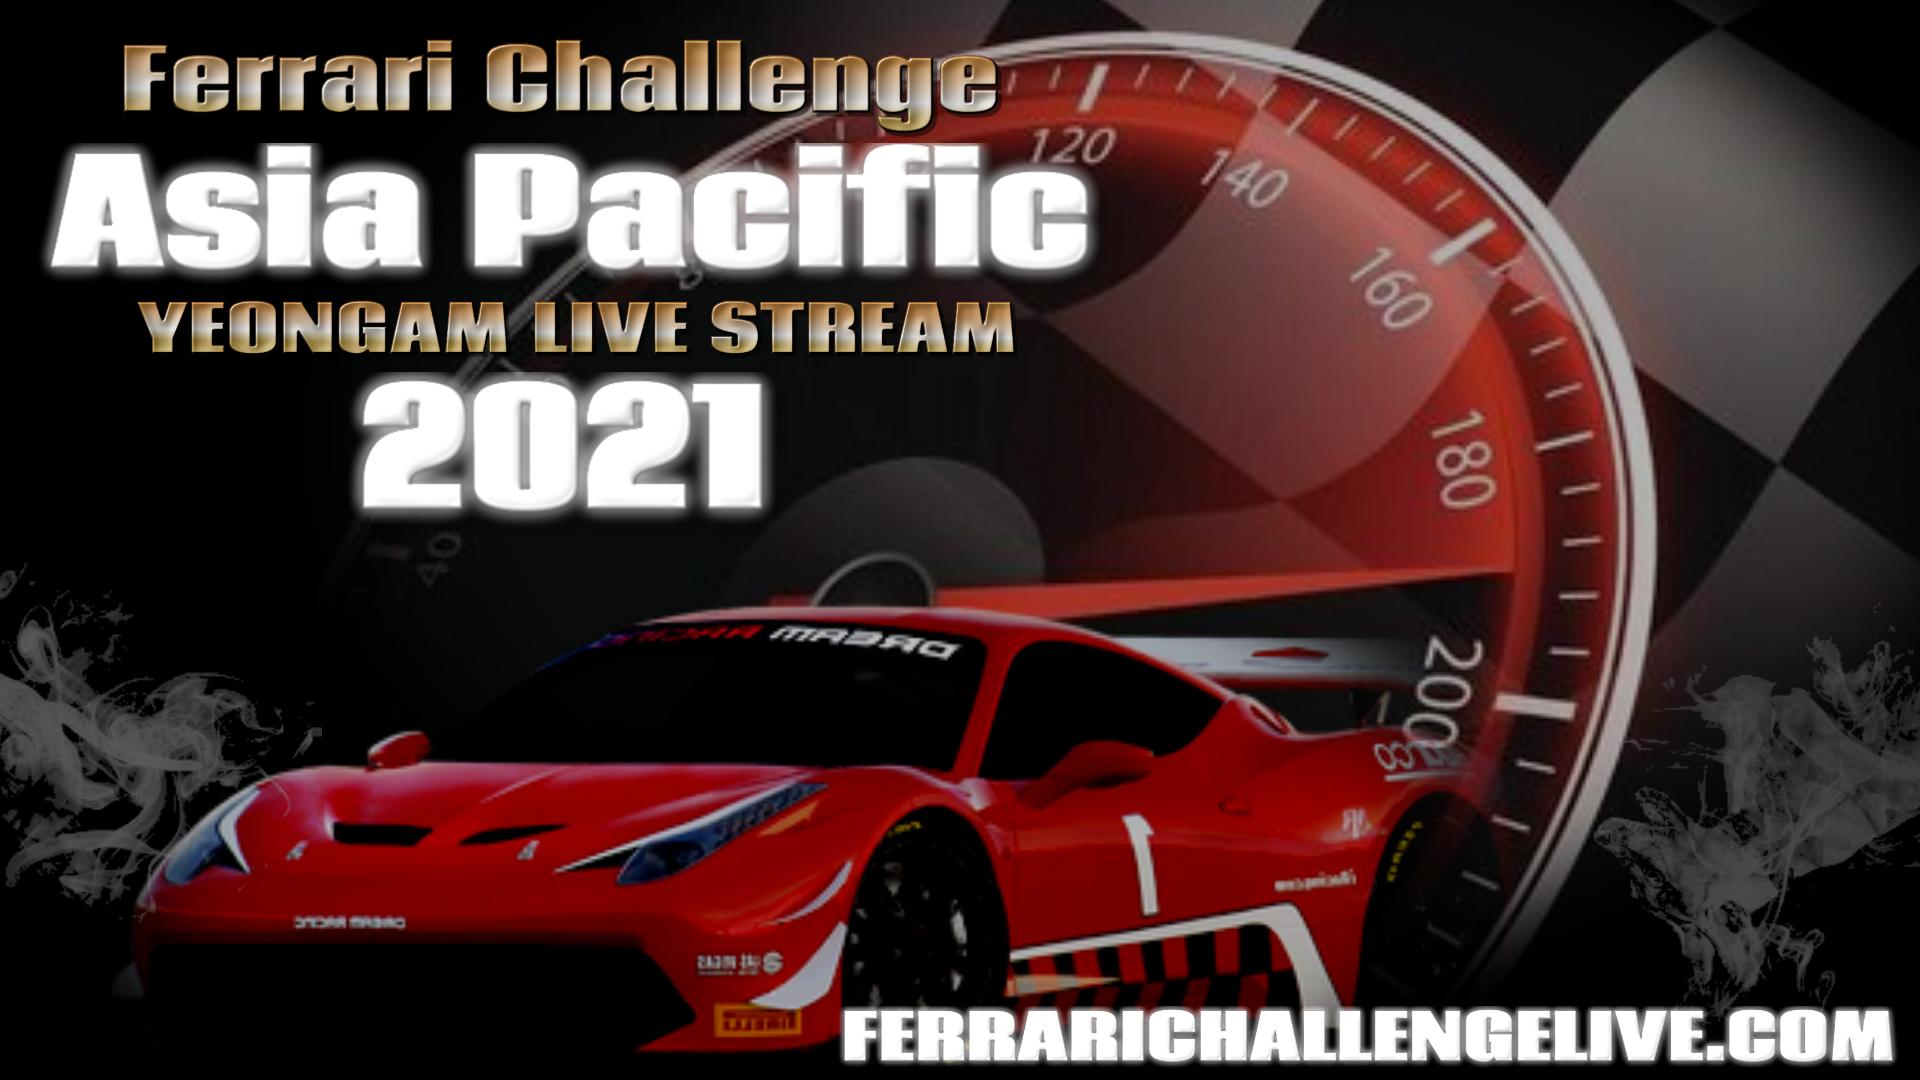 Yeongam Live Stream 2021 | Ferrari Challenge Asia Pacific